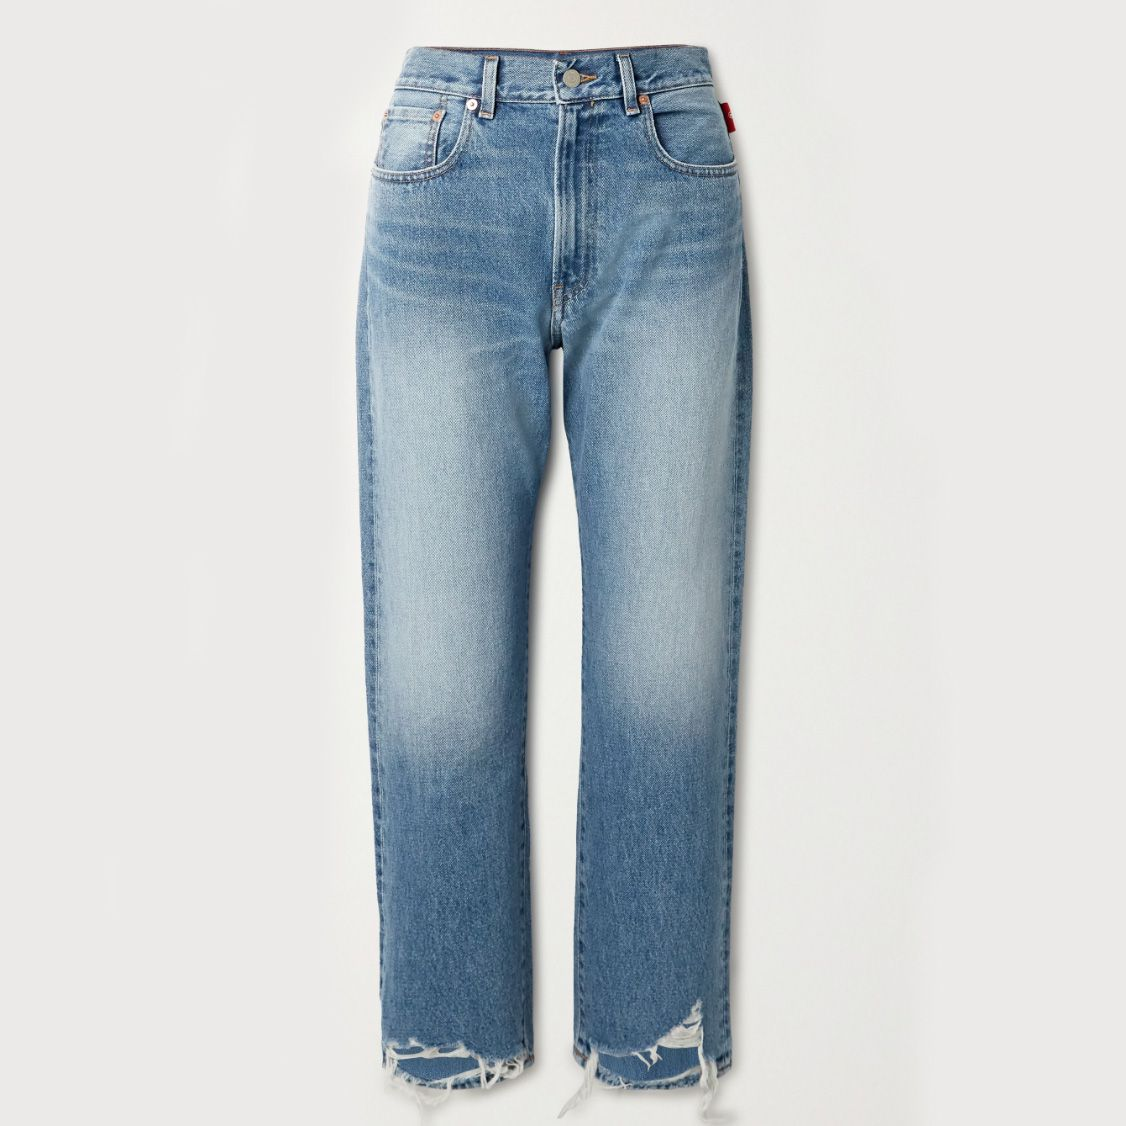 Denimist Distressed Boyfriend Jeans